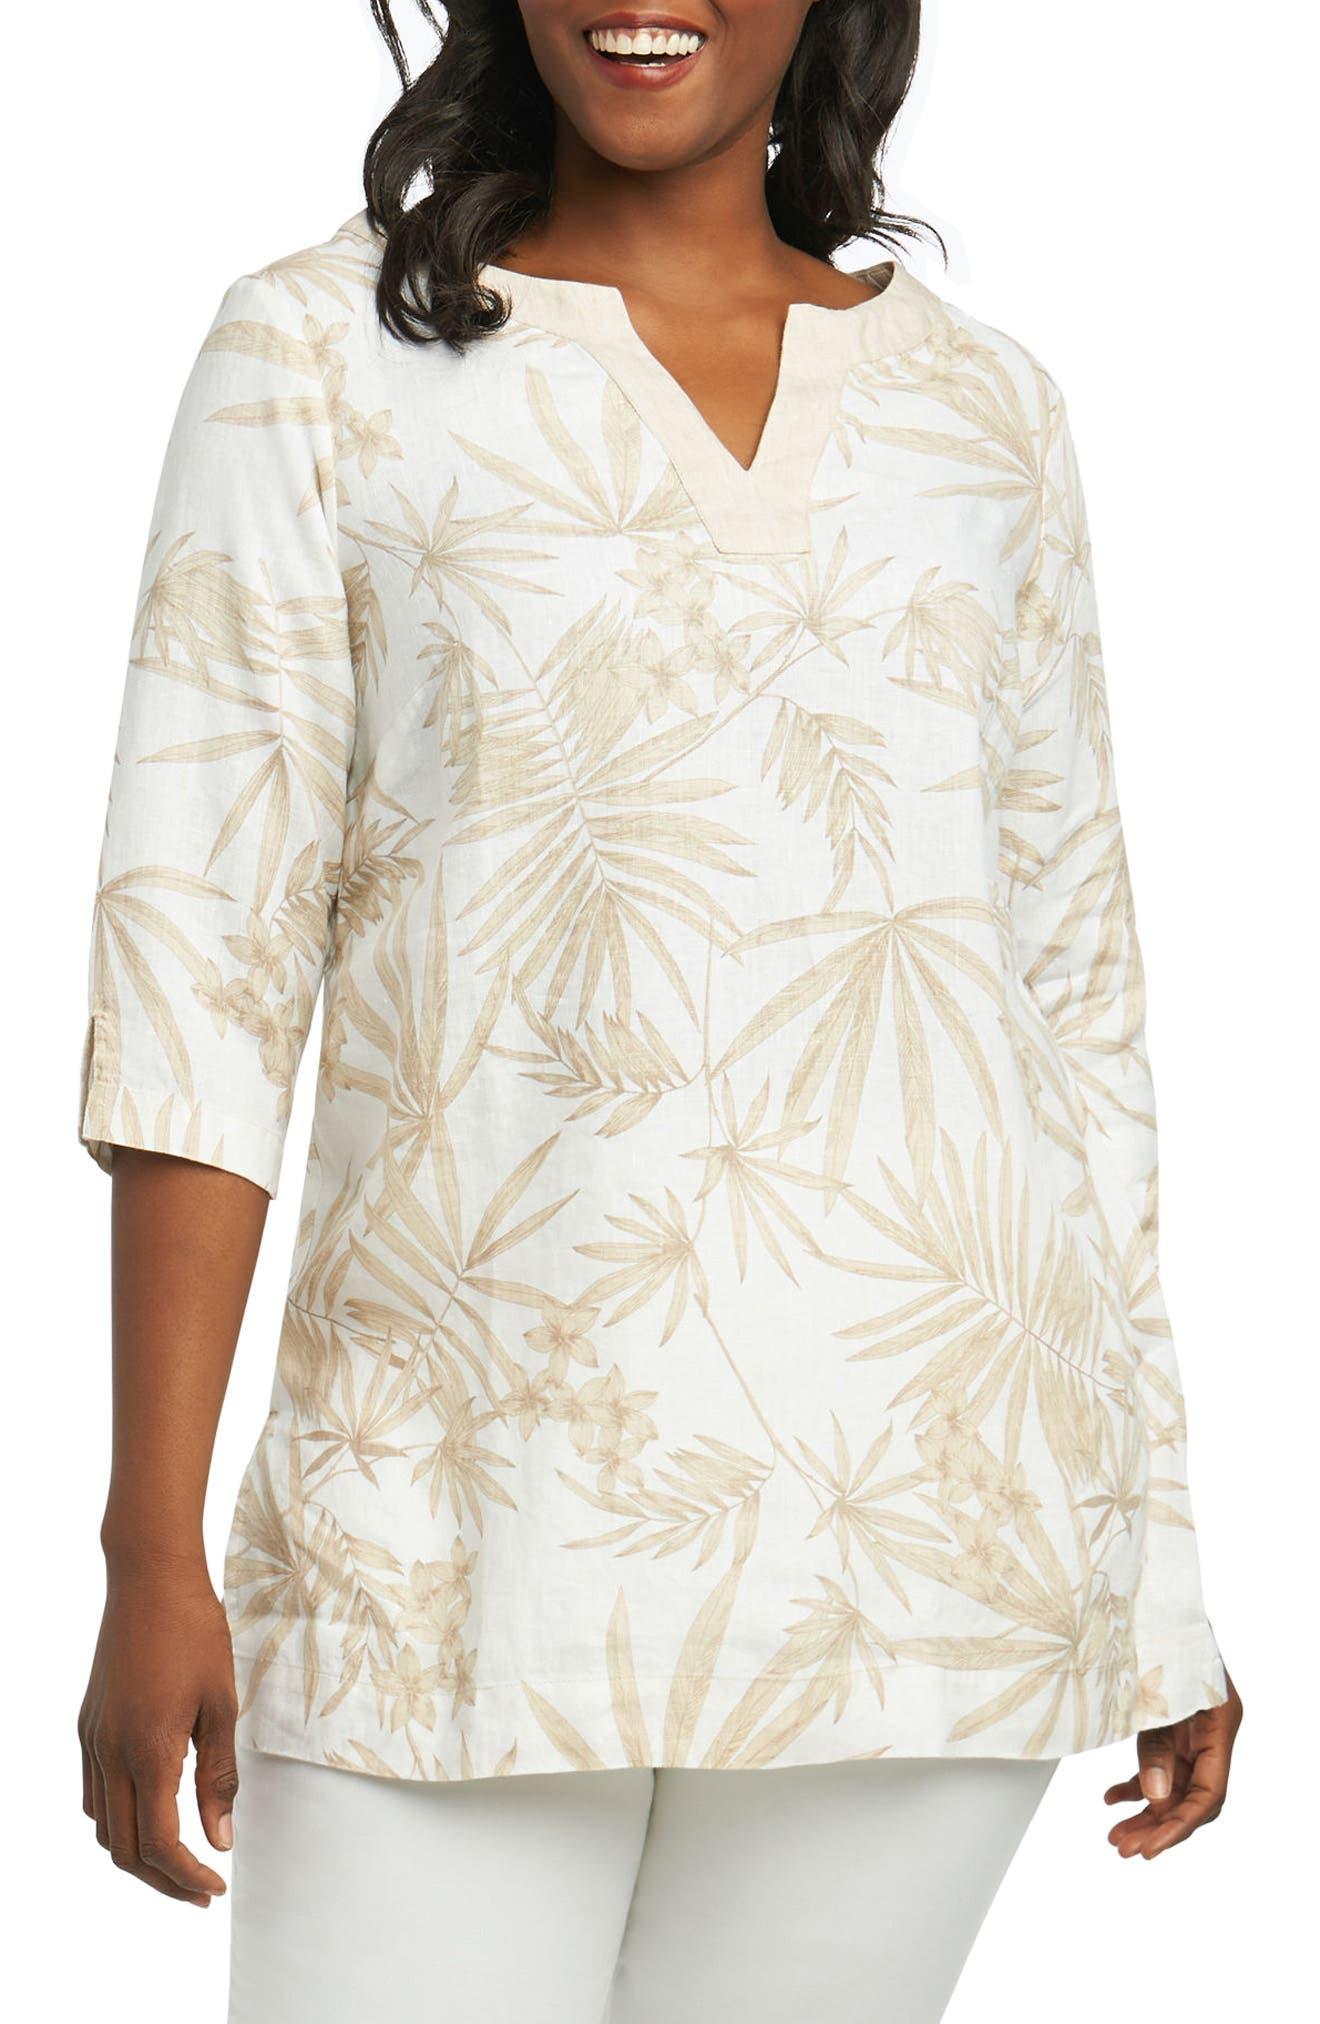 Toni Palm Linen Shirt,                             Main thumbnail 1, color,                             Flax